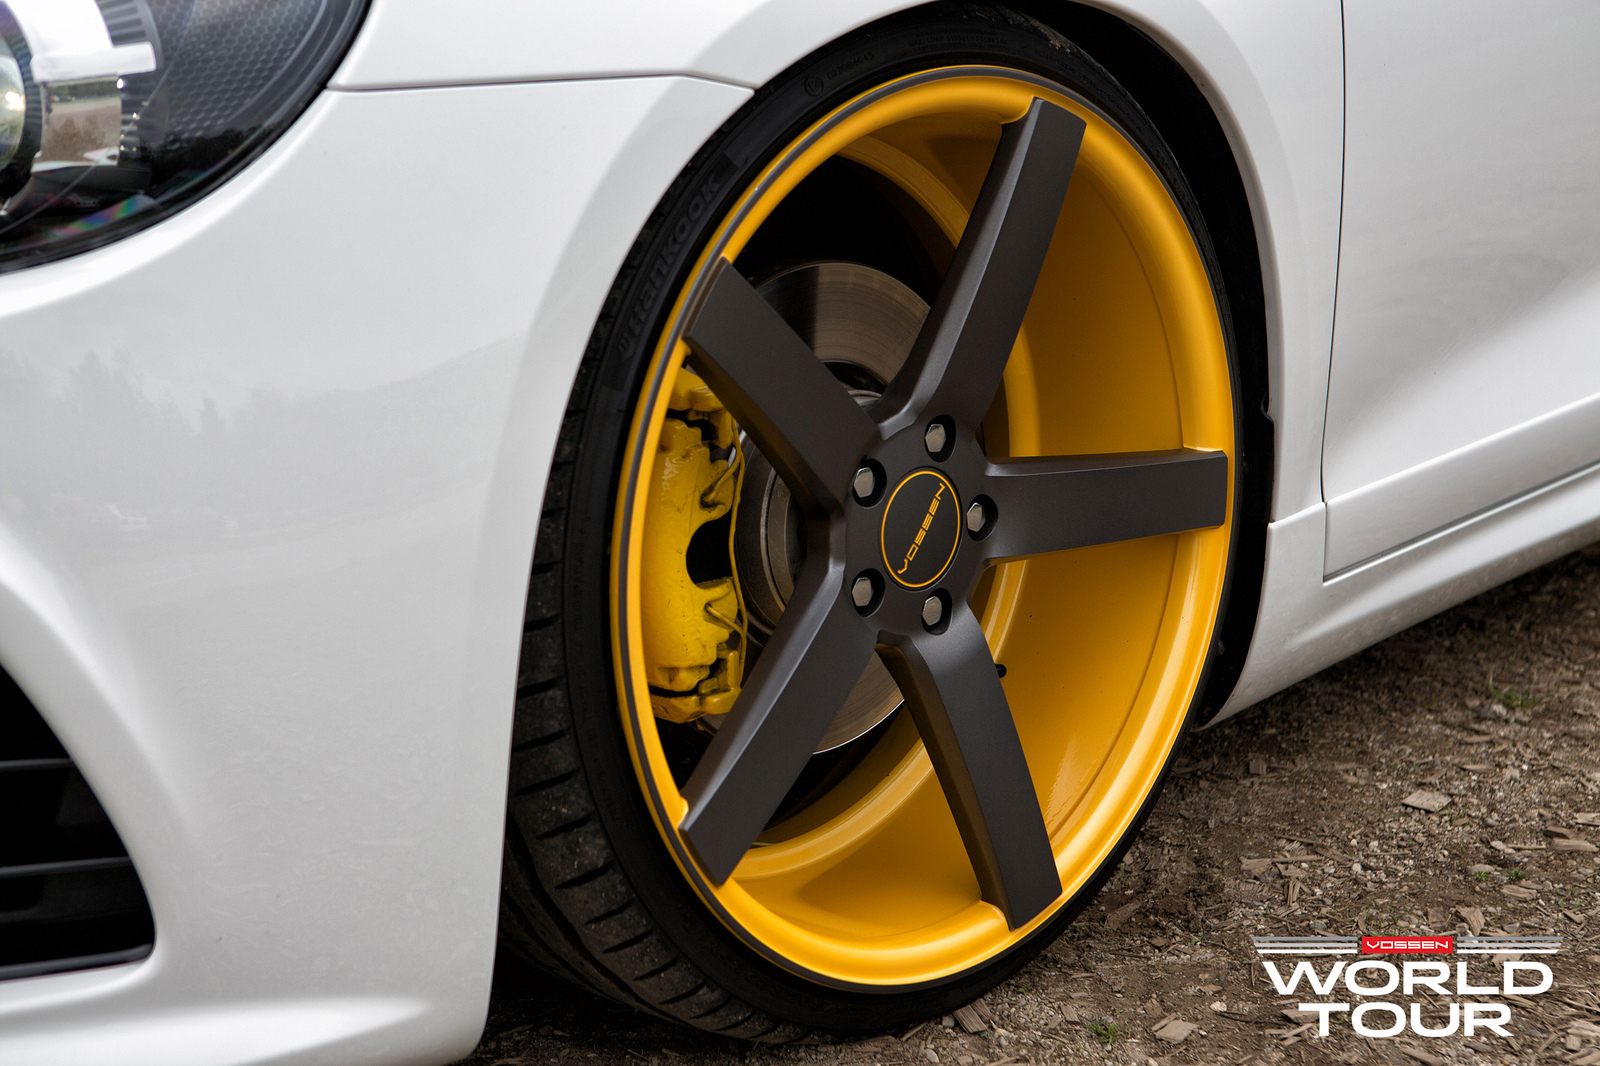 VW Scirocco R Slammed on Vossen Wheels - autoevolution